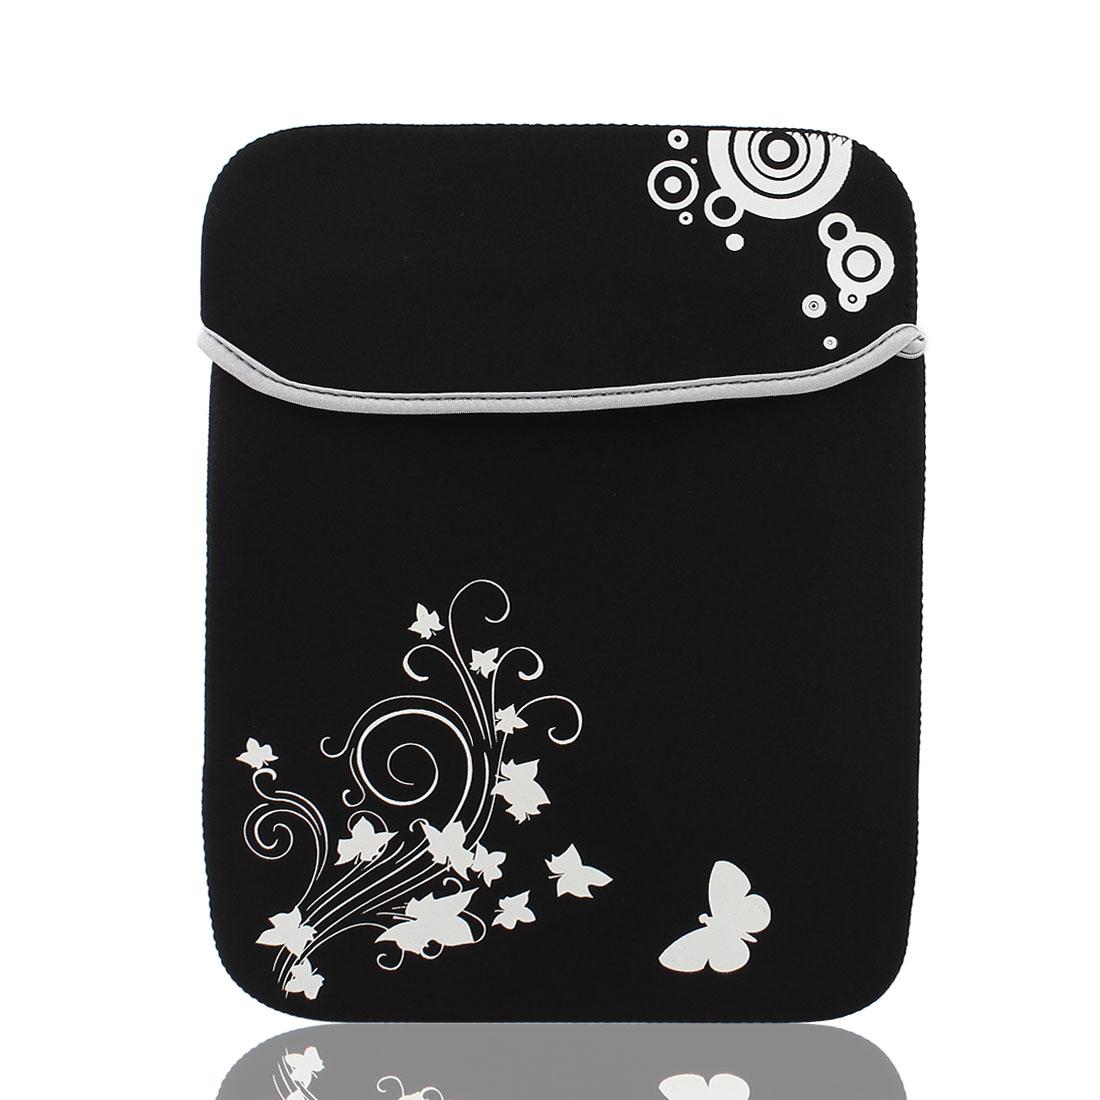 "12"" Flower Butterfly Pattern Soft PC Laptop Tablet Netbook Sleeve Case Bag Black"